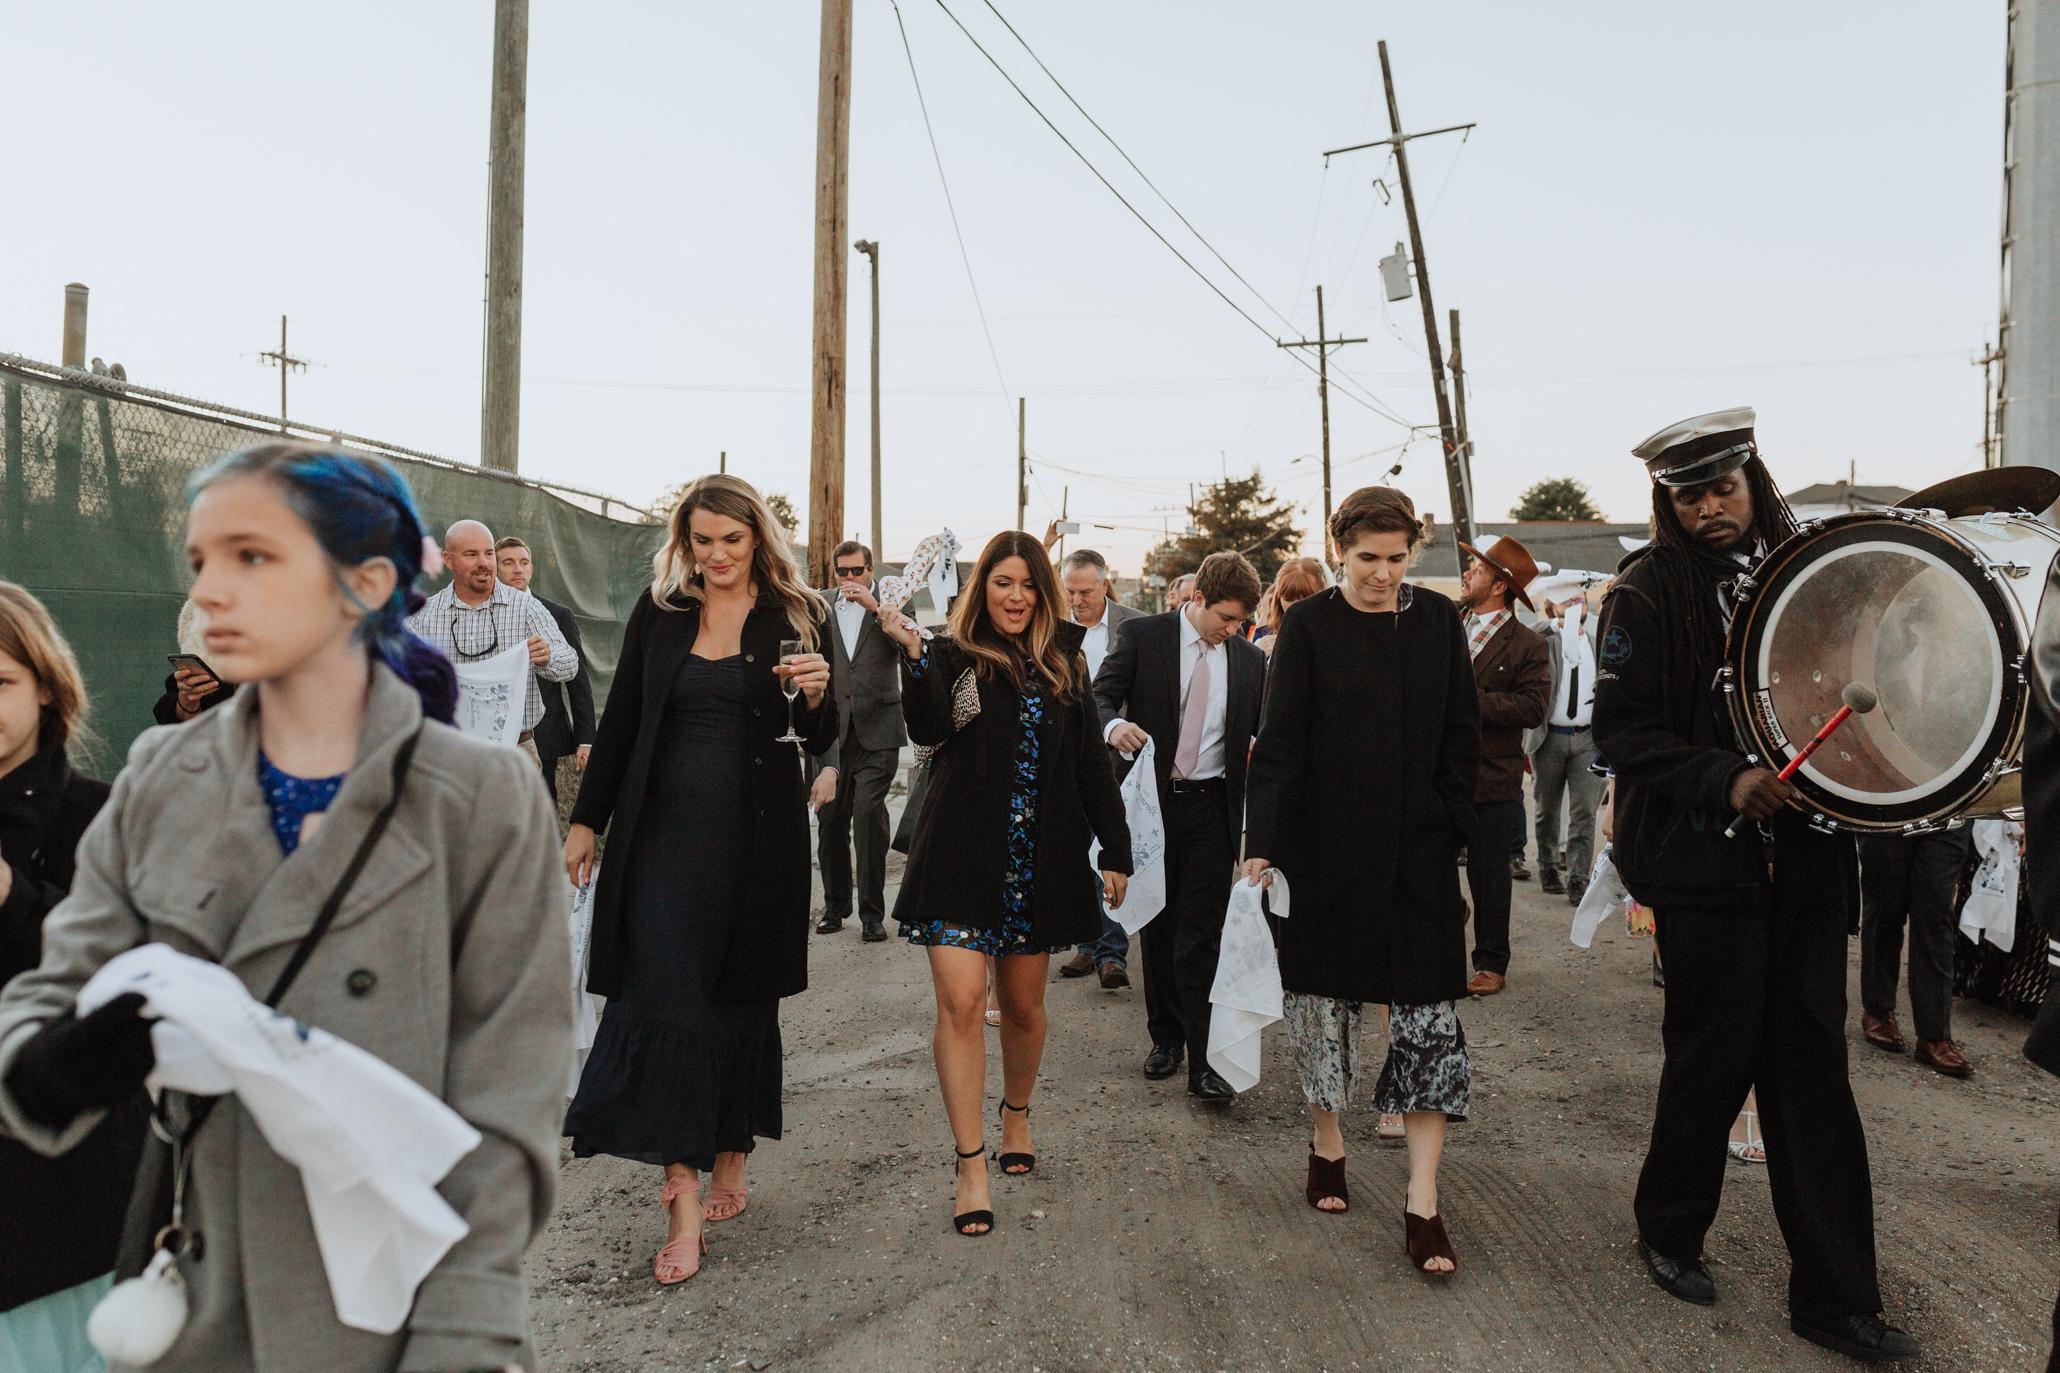 race religious wedding new orleans-82.jpg